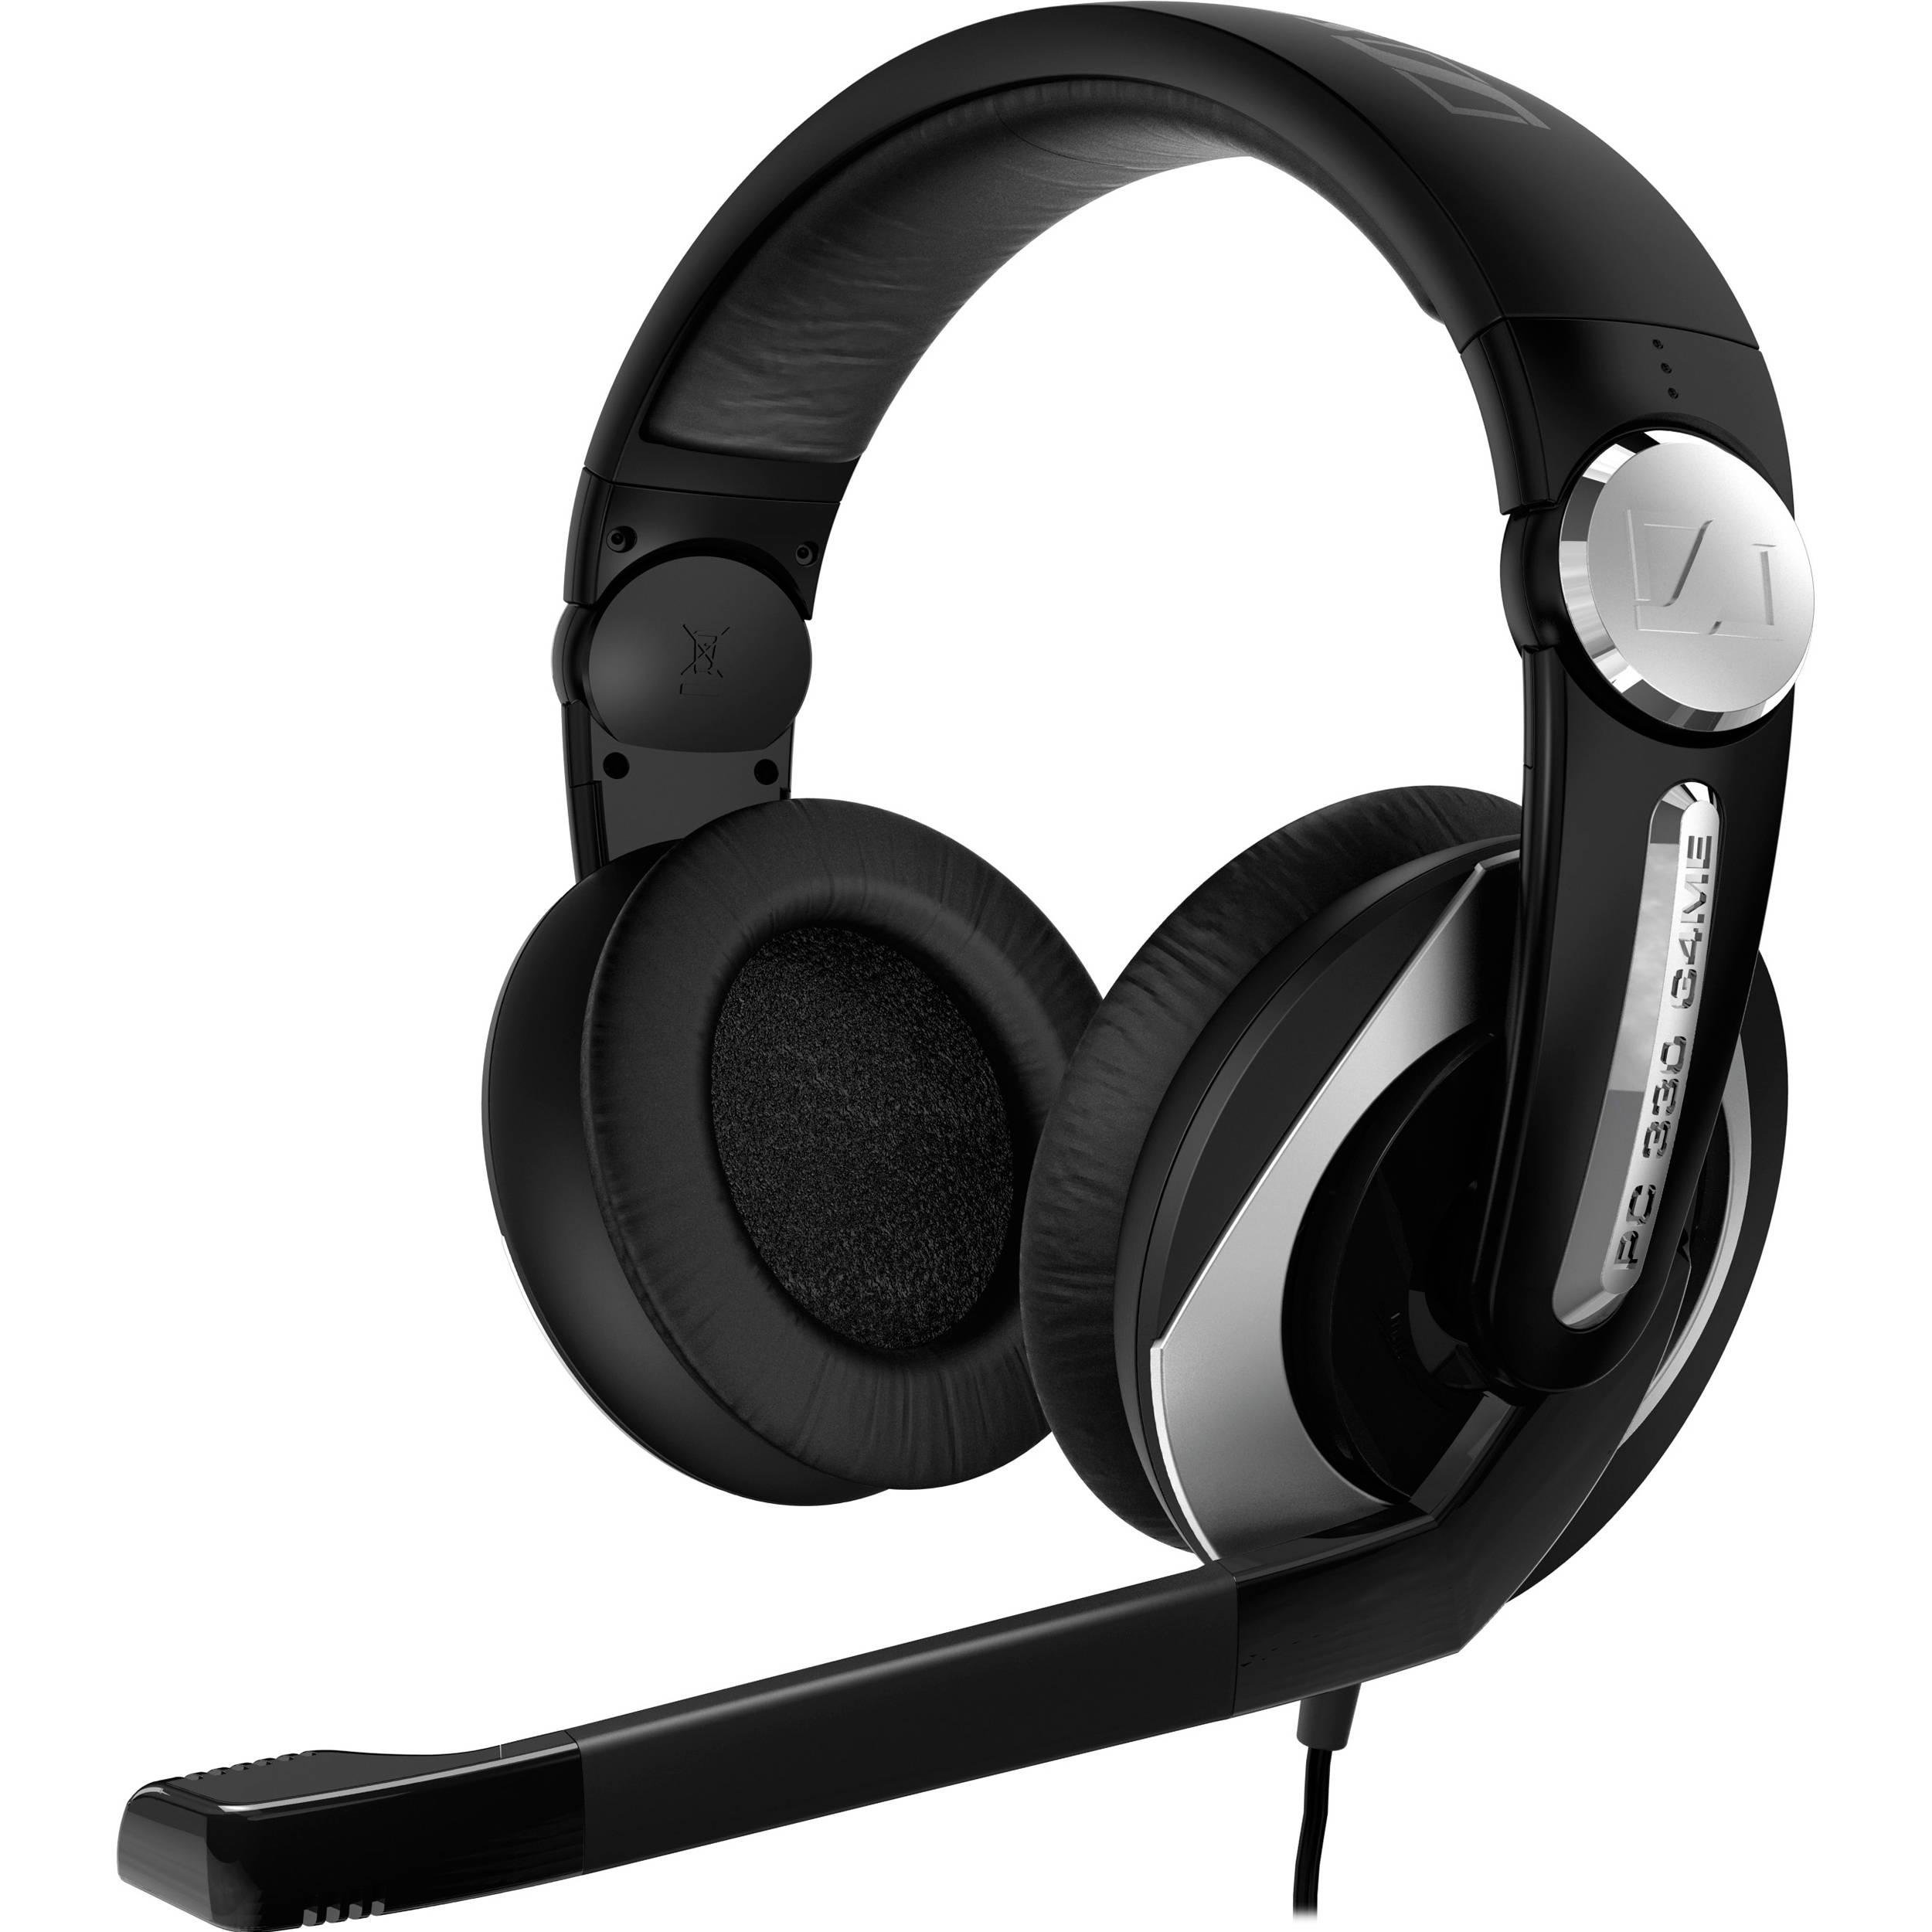 sennheiser pc 330 gaming headset pc330 b h photo video. Black Bedroom Furniture Sets. Home Design Ideas